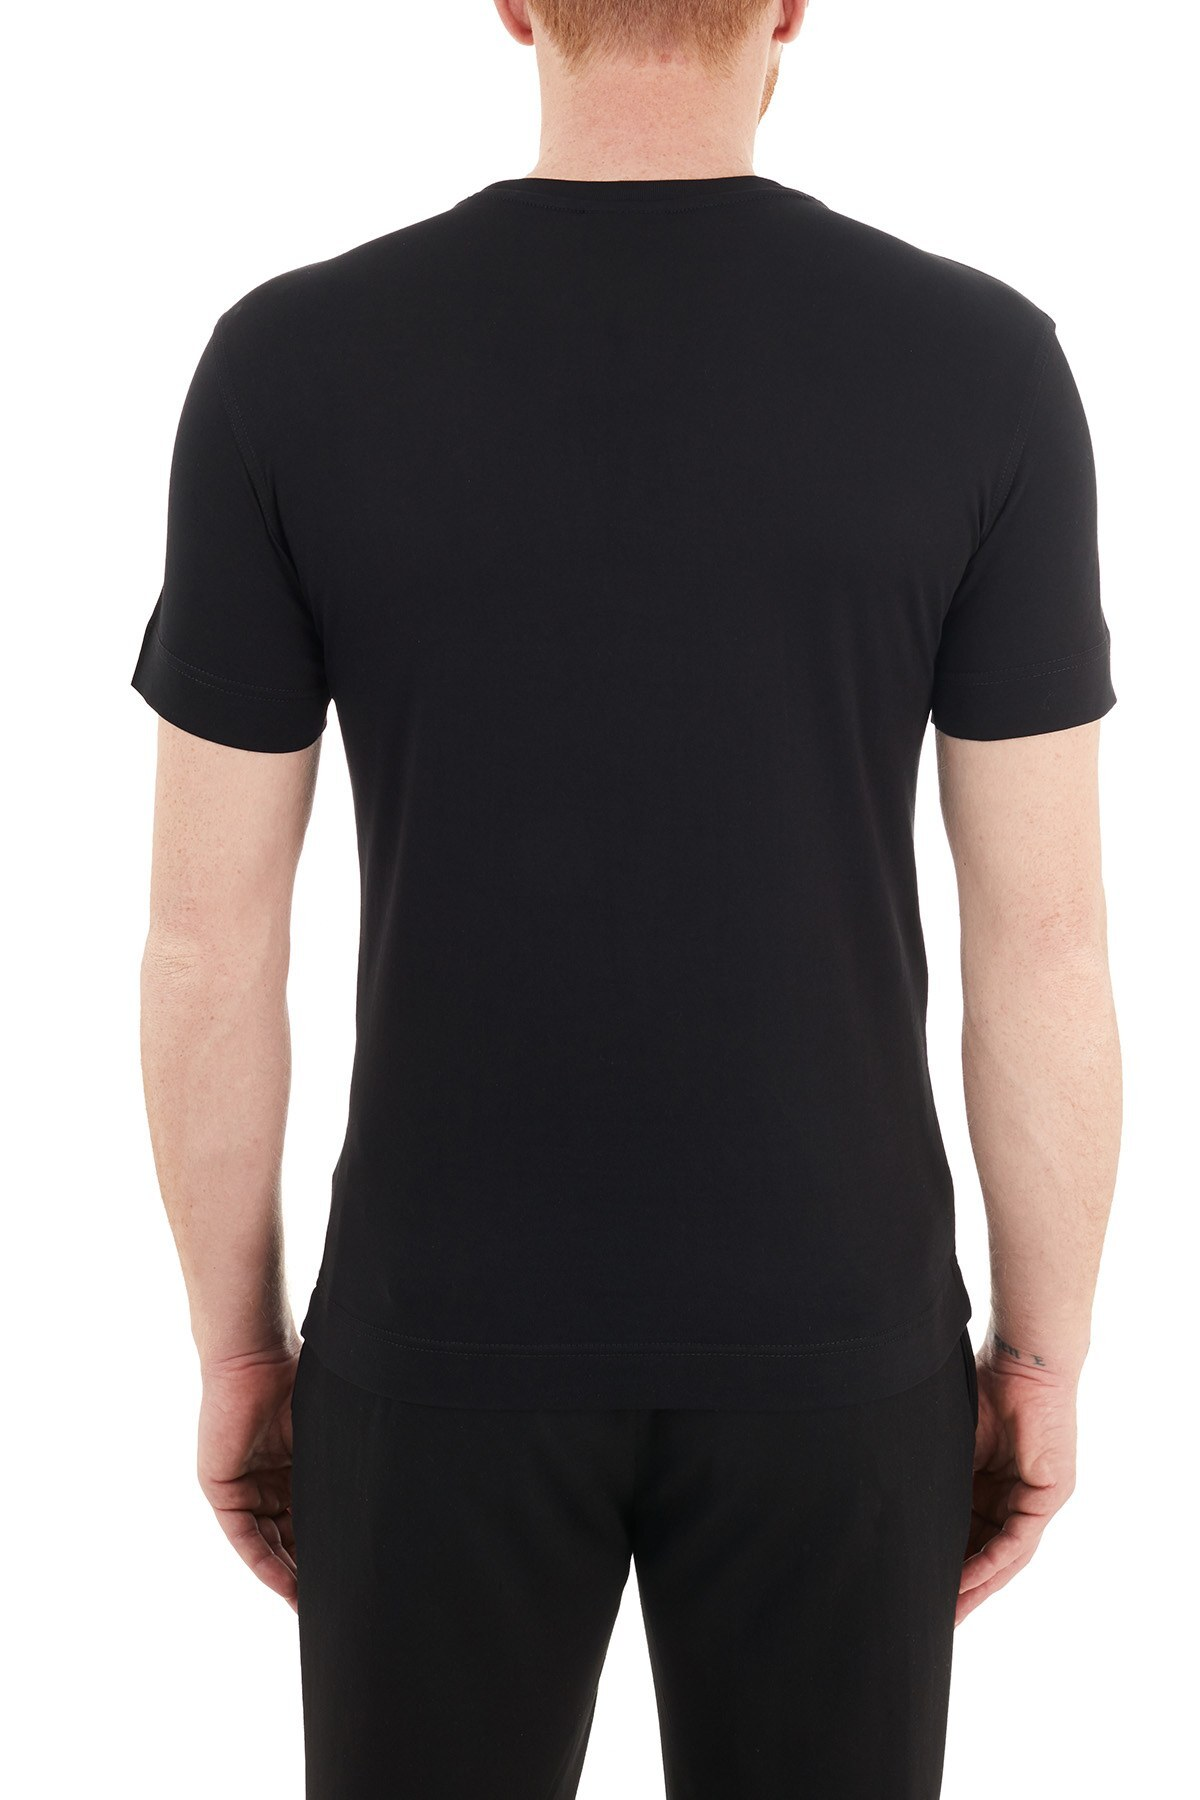 Emporio Armani Baskılı Bisiklet Yaka % 100 Pamuk Erkek T Shirt 3K1TE6 1JSHZ 0999 SİYAH